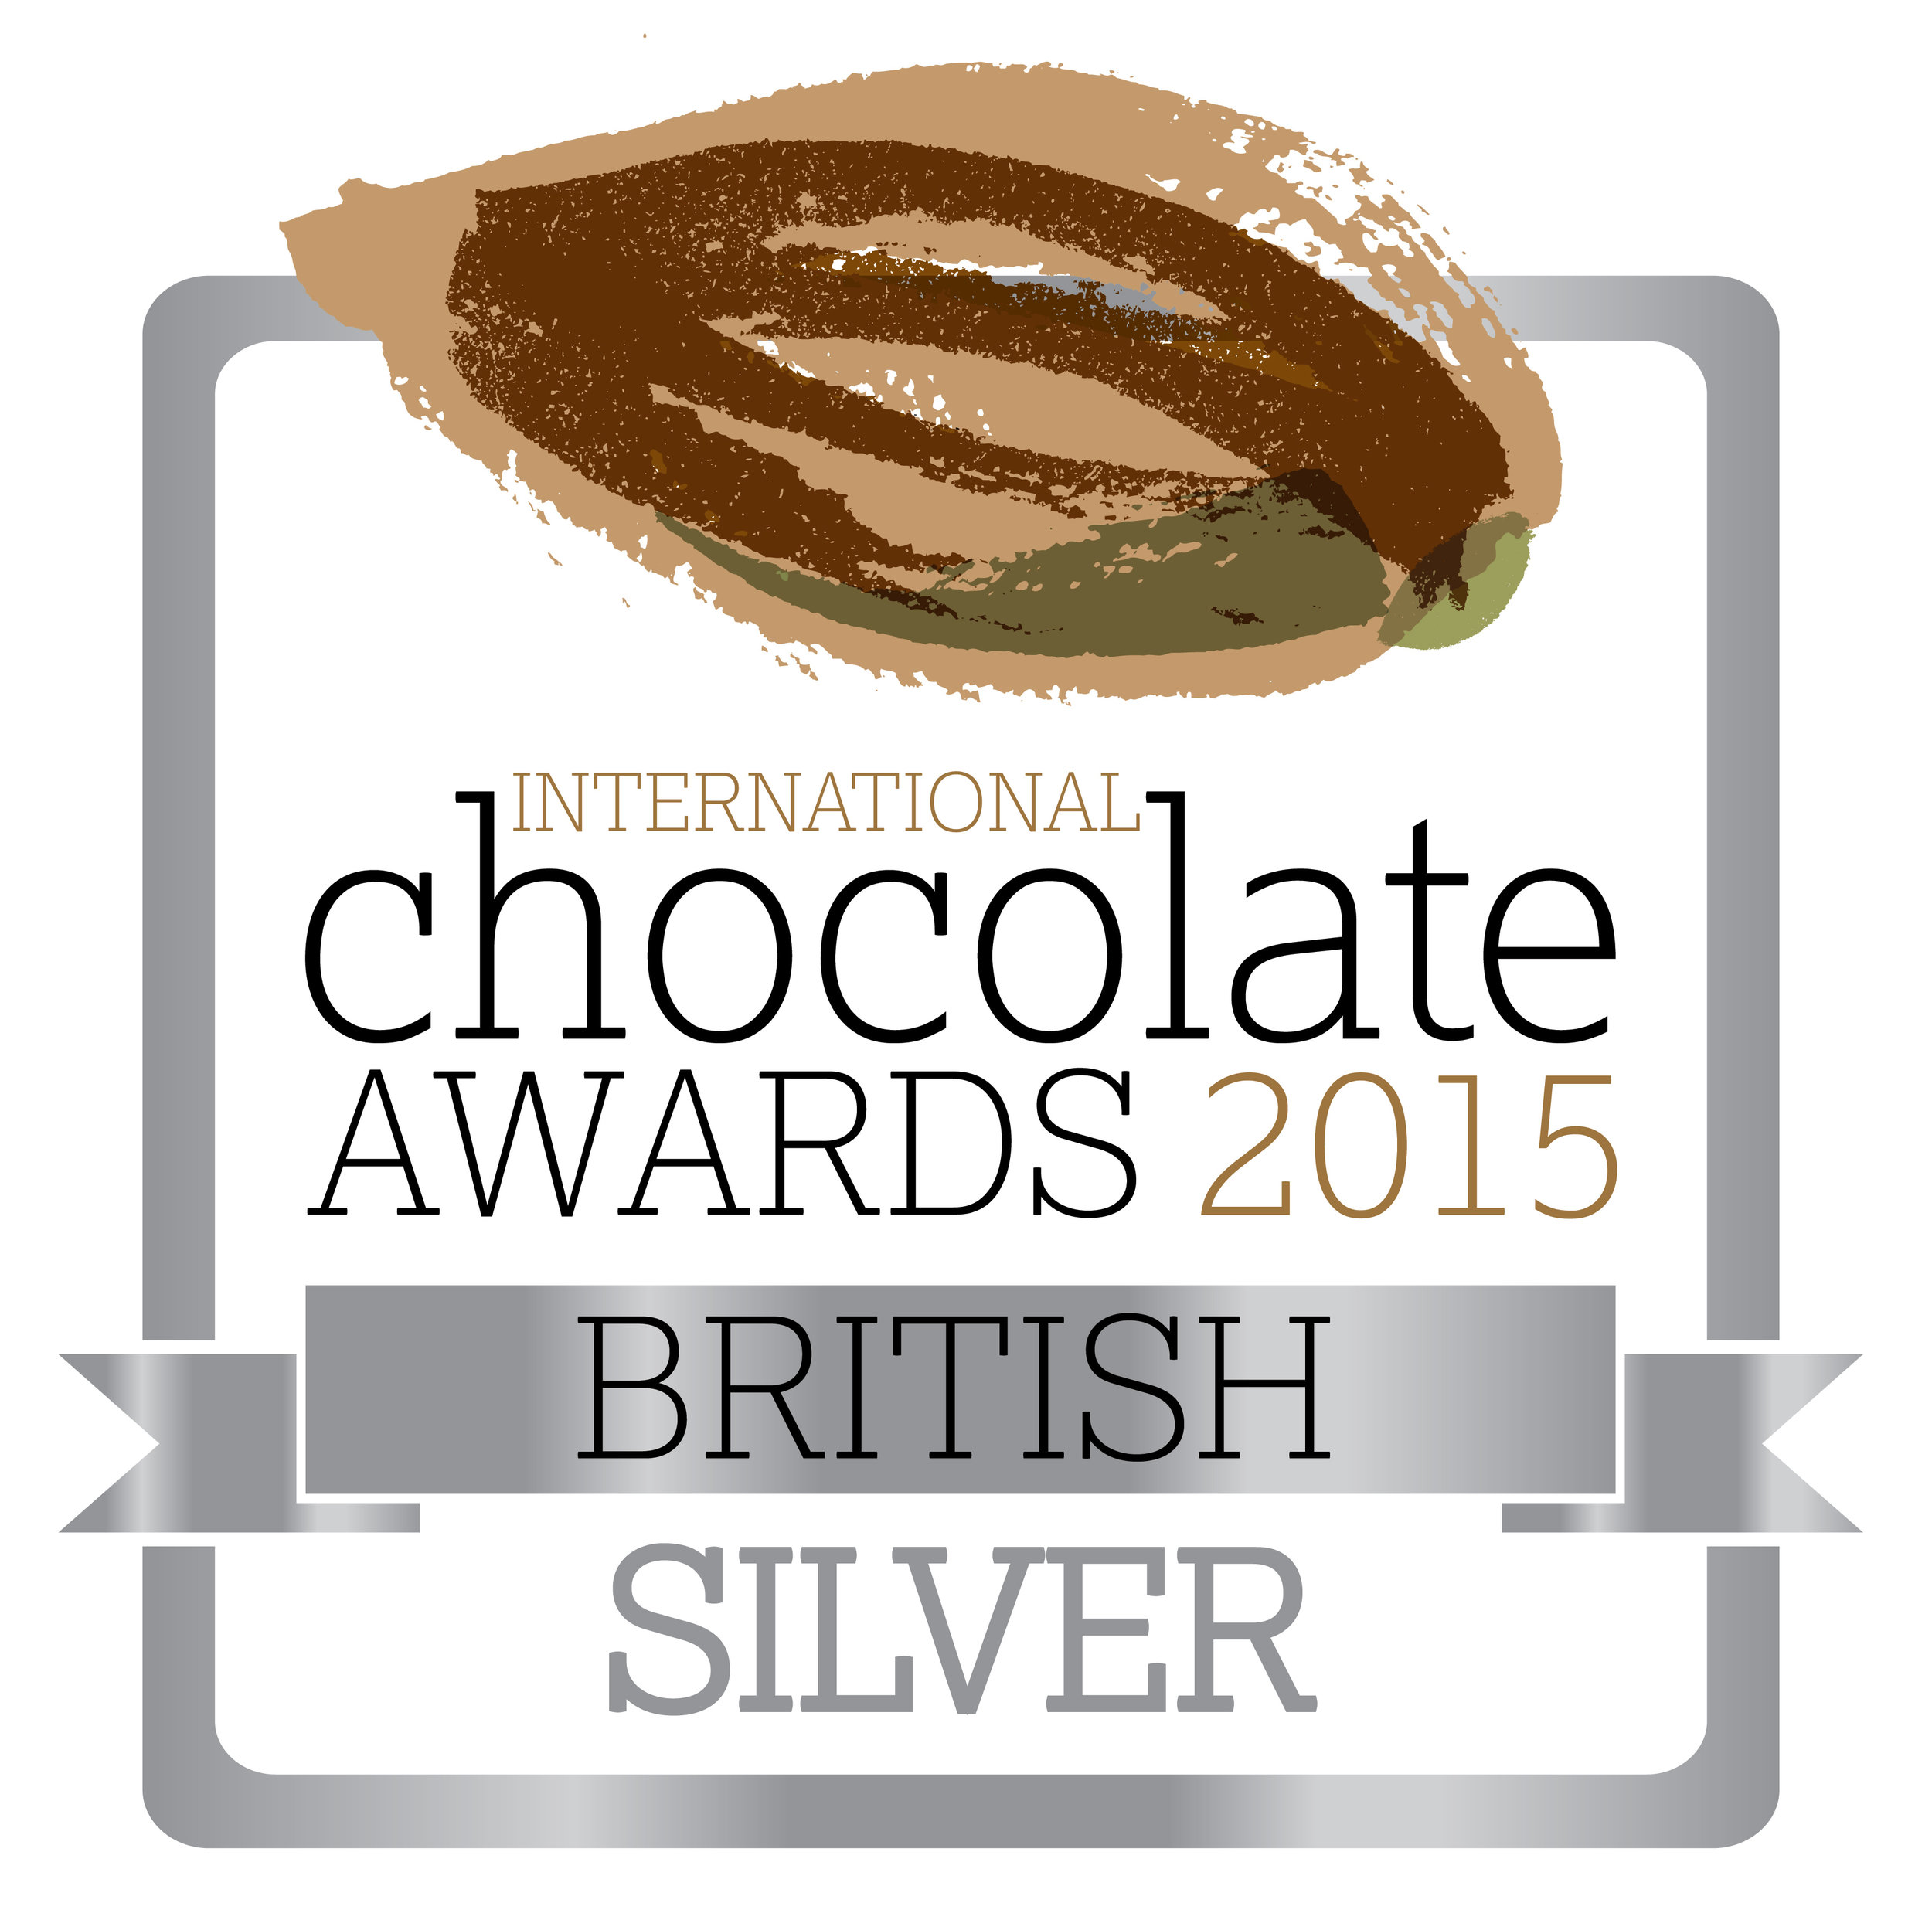 International Chocolate Awards 2015 - Silver - British RGB.jpg